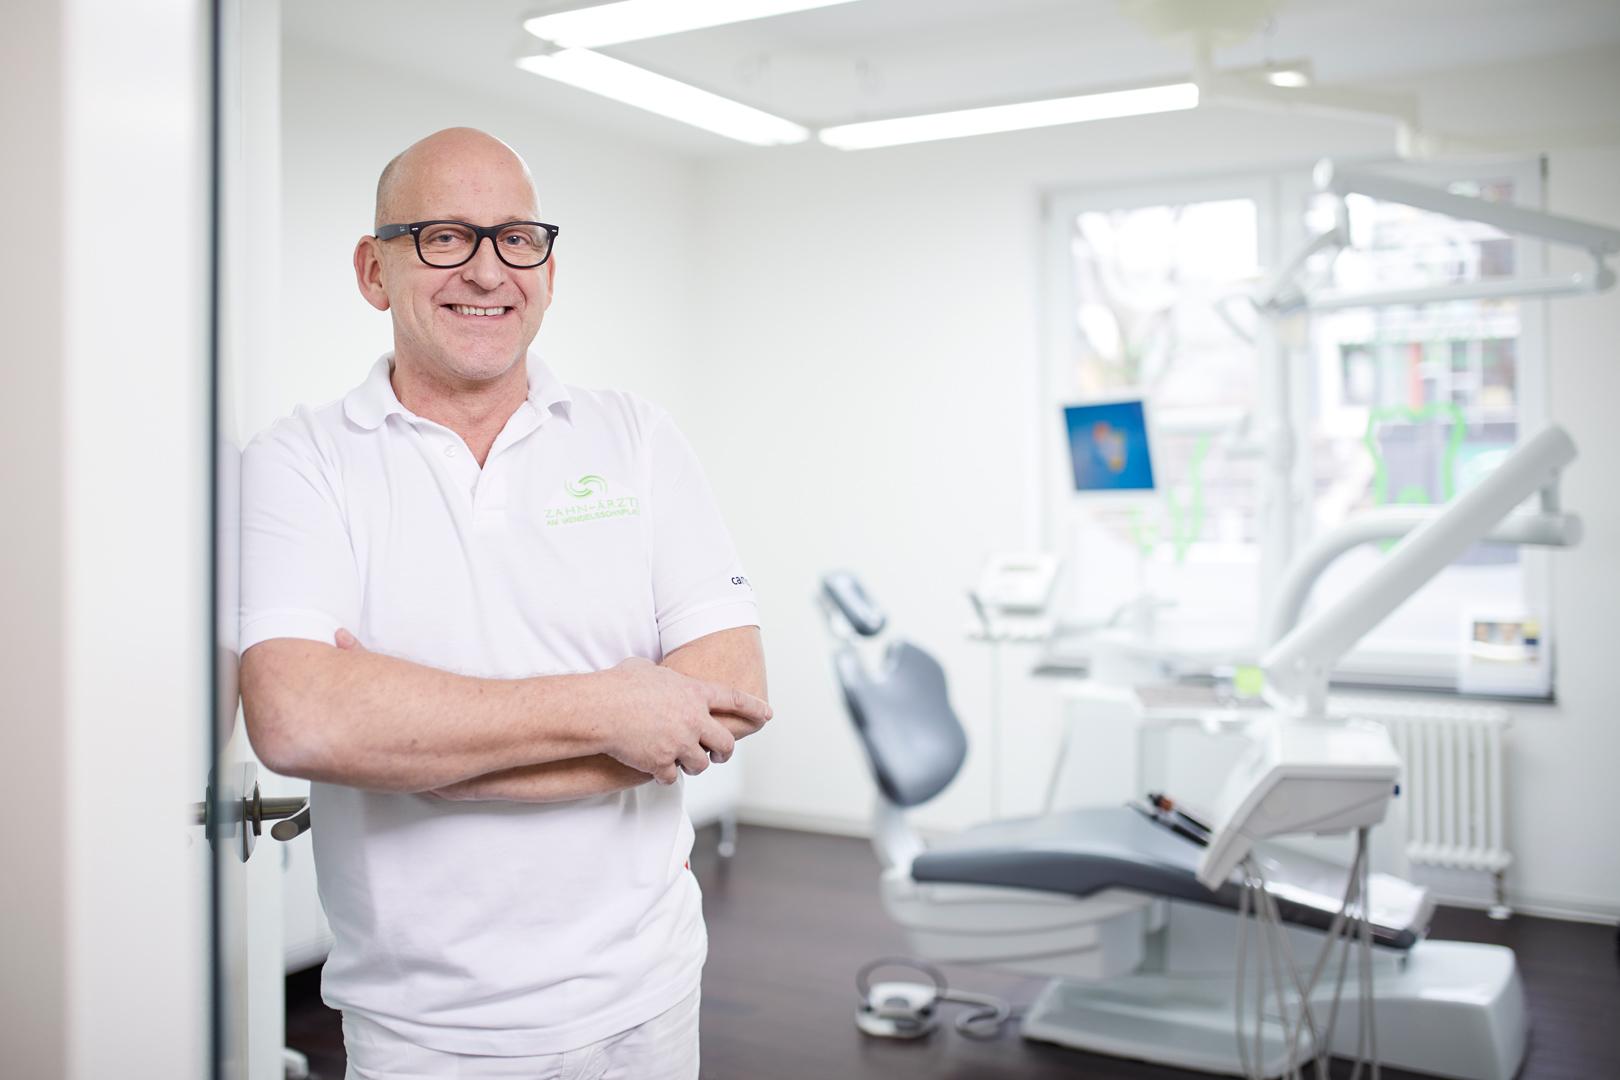 Zahnarzt Hammer Karlsruhe zahnarzt hammer karlsruhe hausdesignhub co